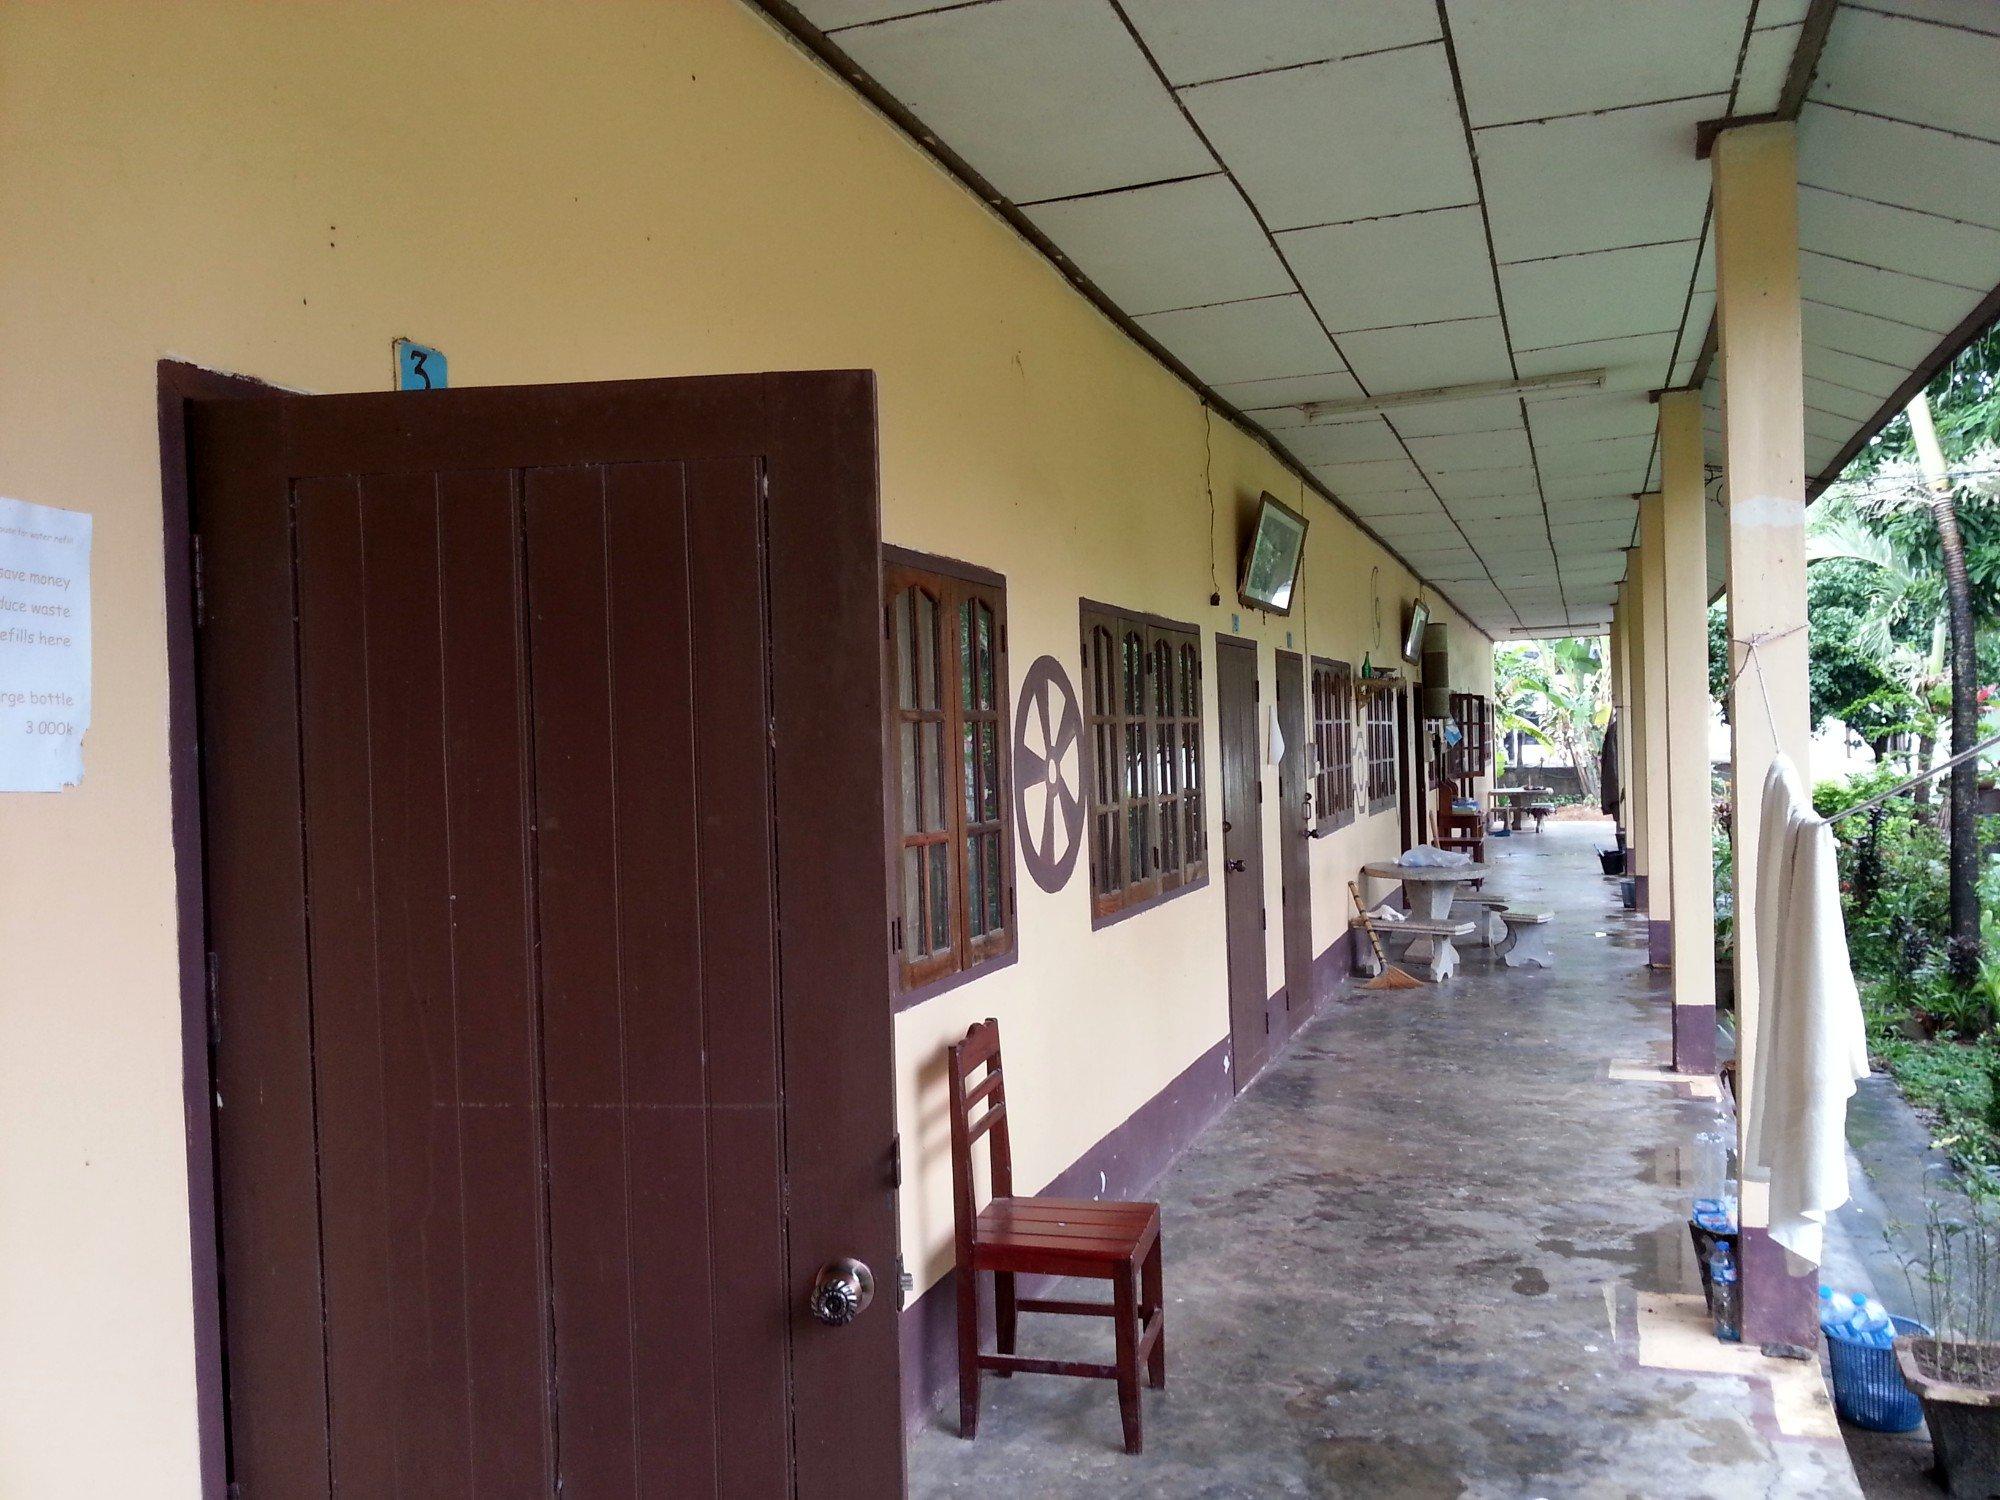 Sengkeo Guesthouse in Vang Vieng